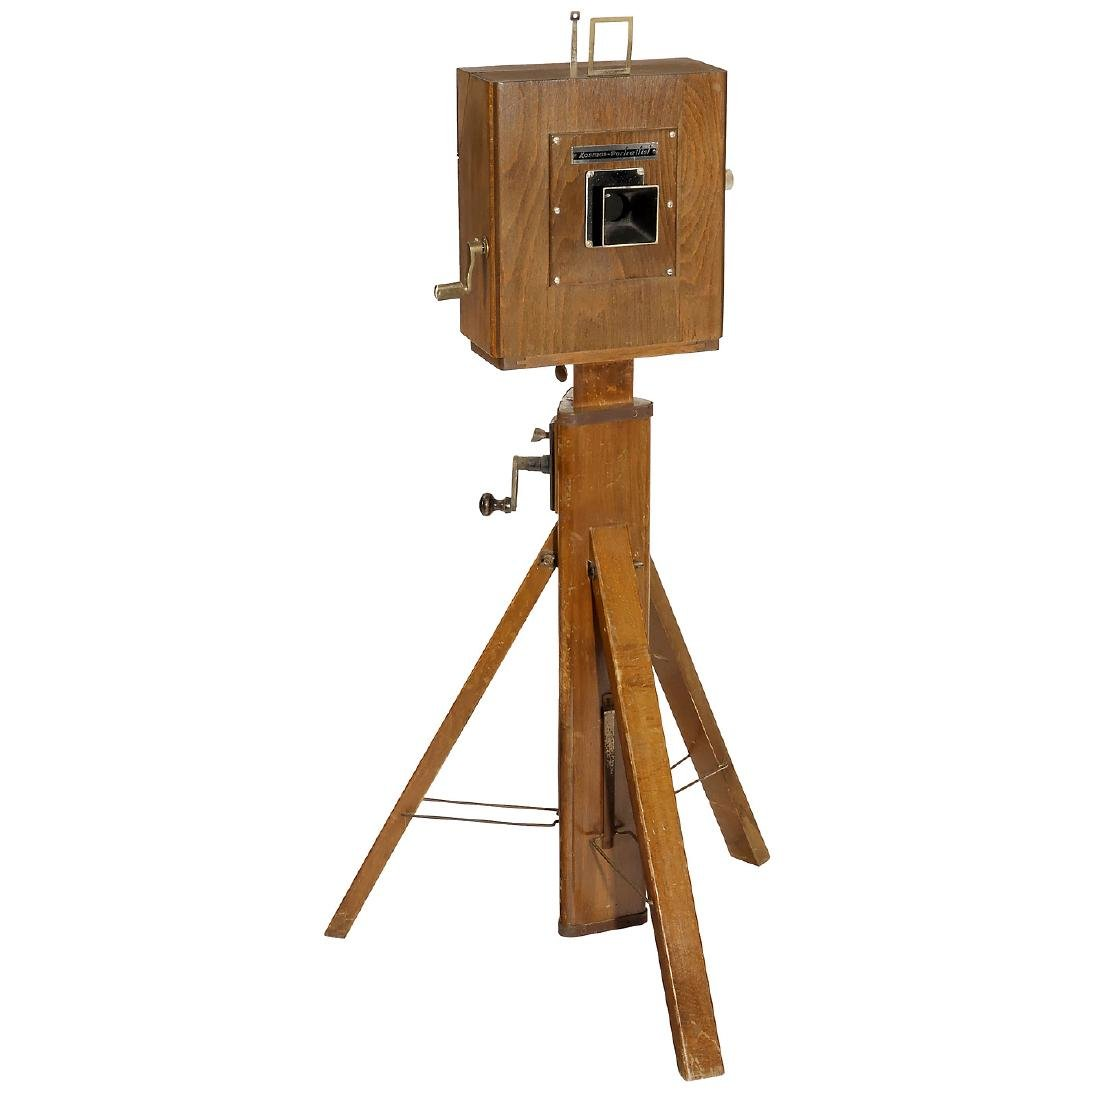 Kosmos-Portraitist Multiplying Camera, 1938-50